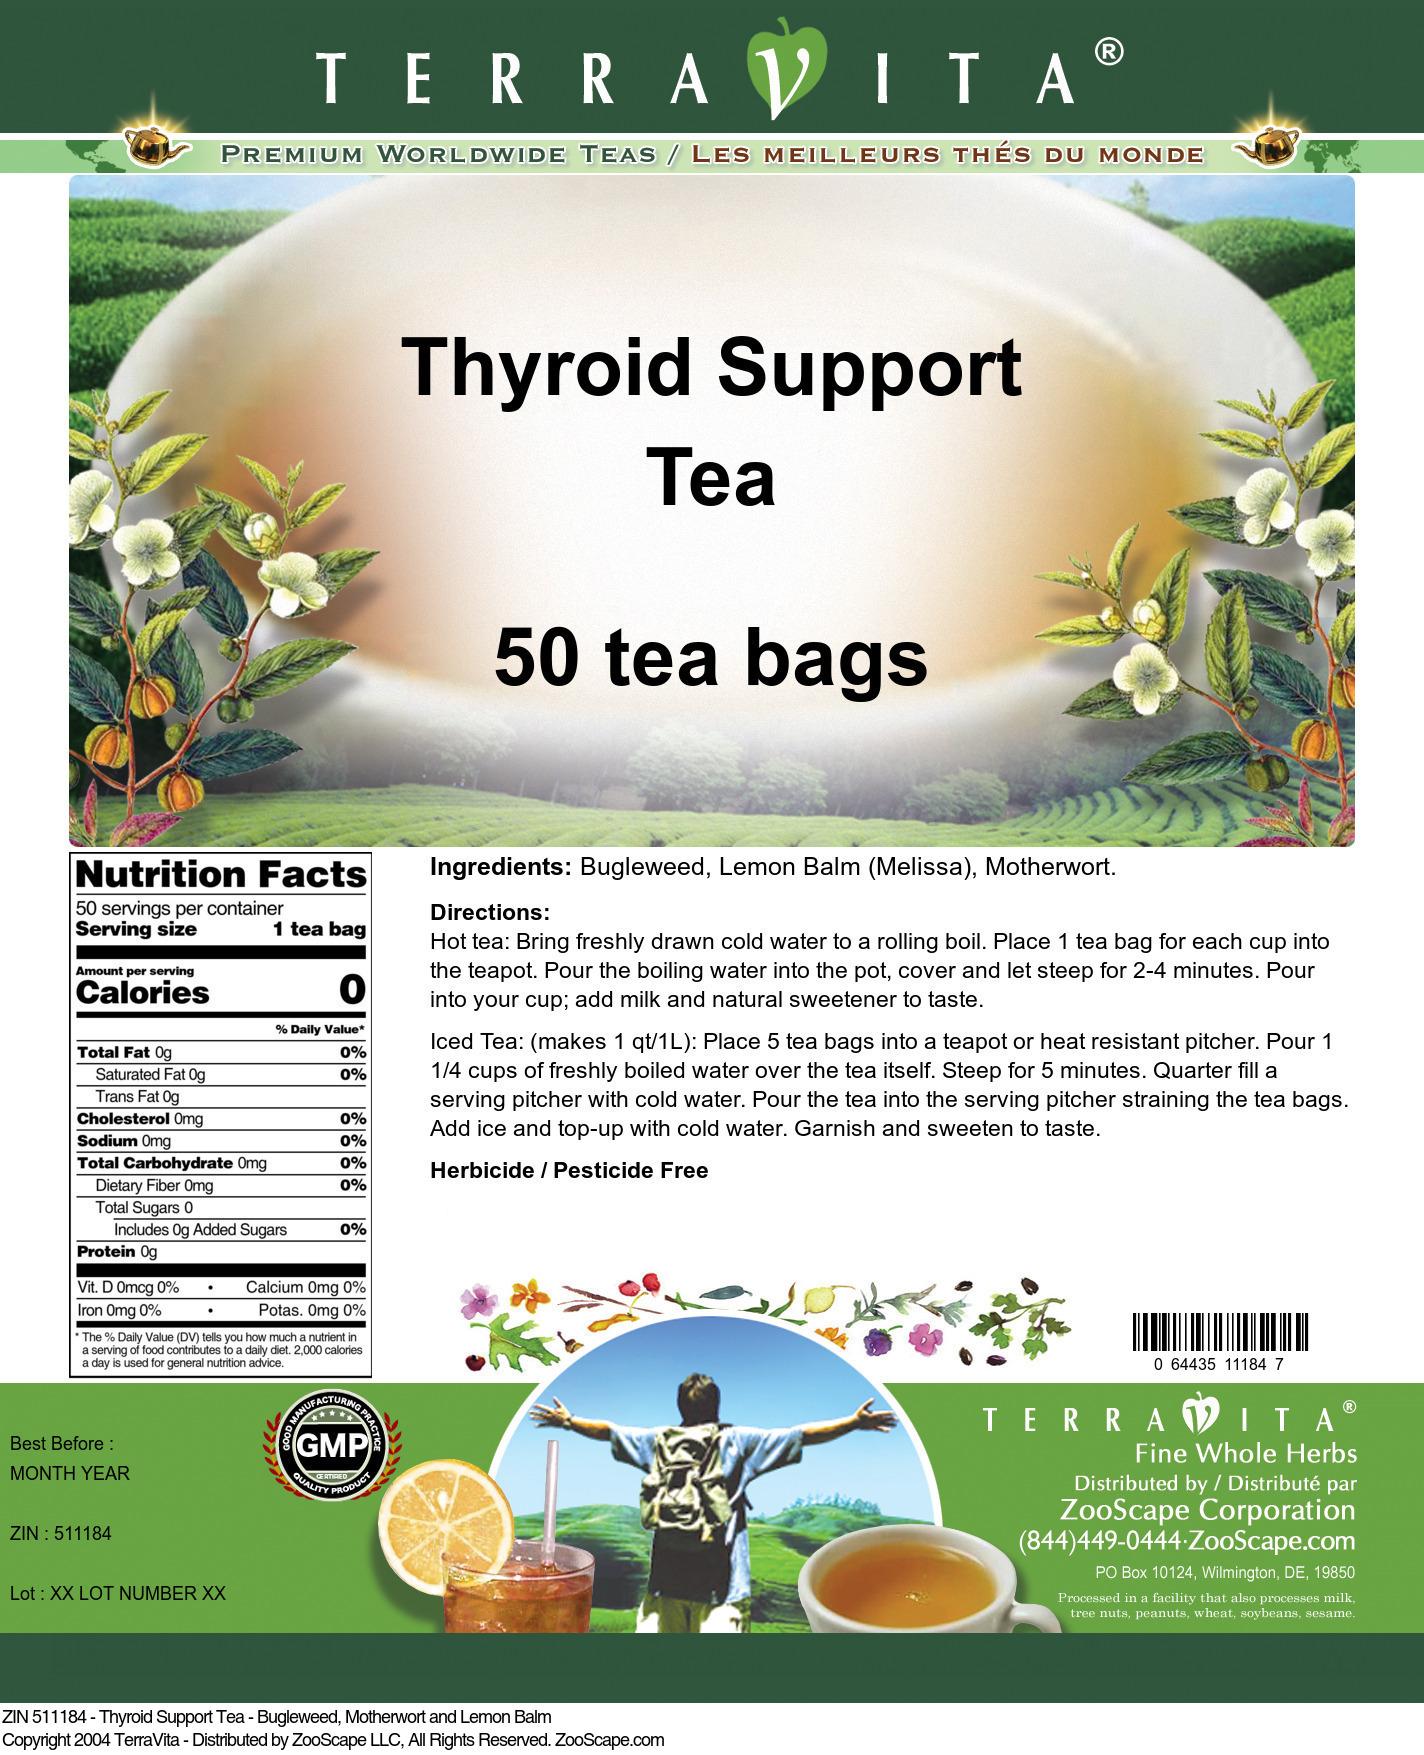 Thyroid Support Tea - Bugleweed, Motherwort and Lemon Balm - Label